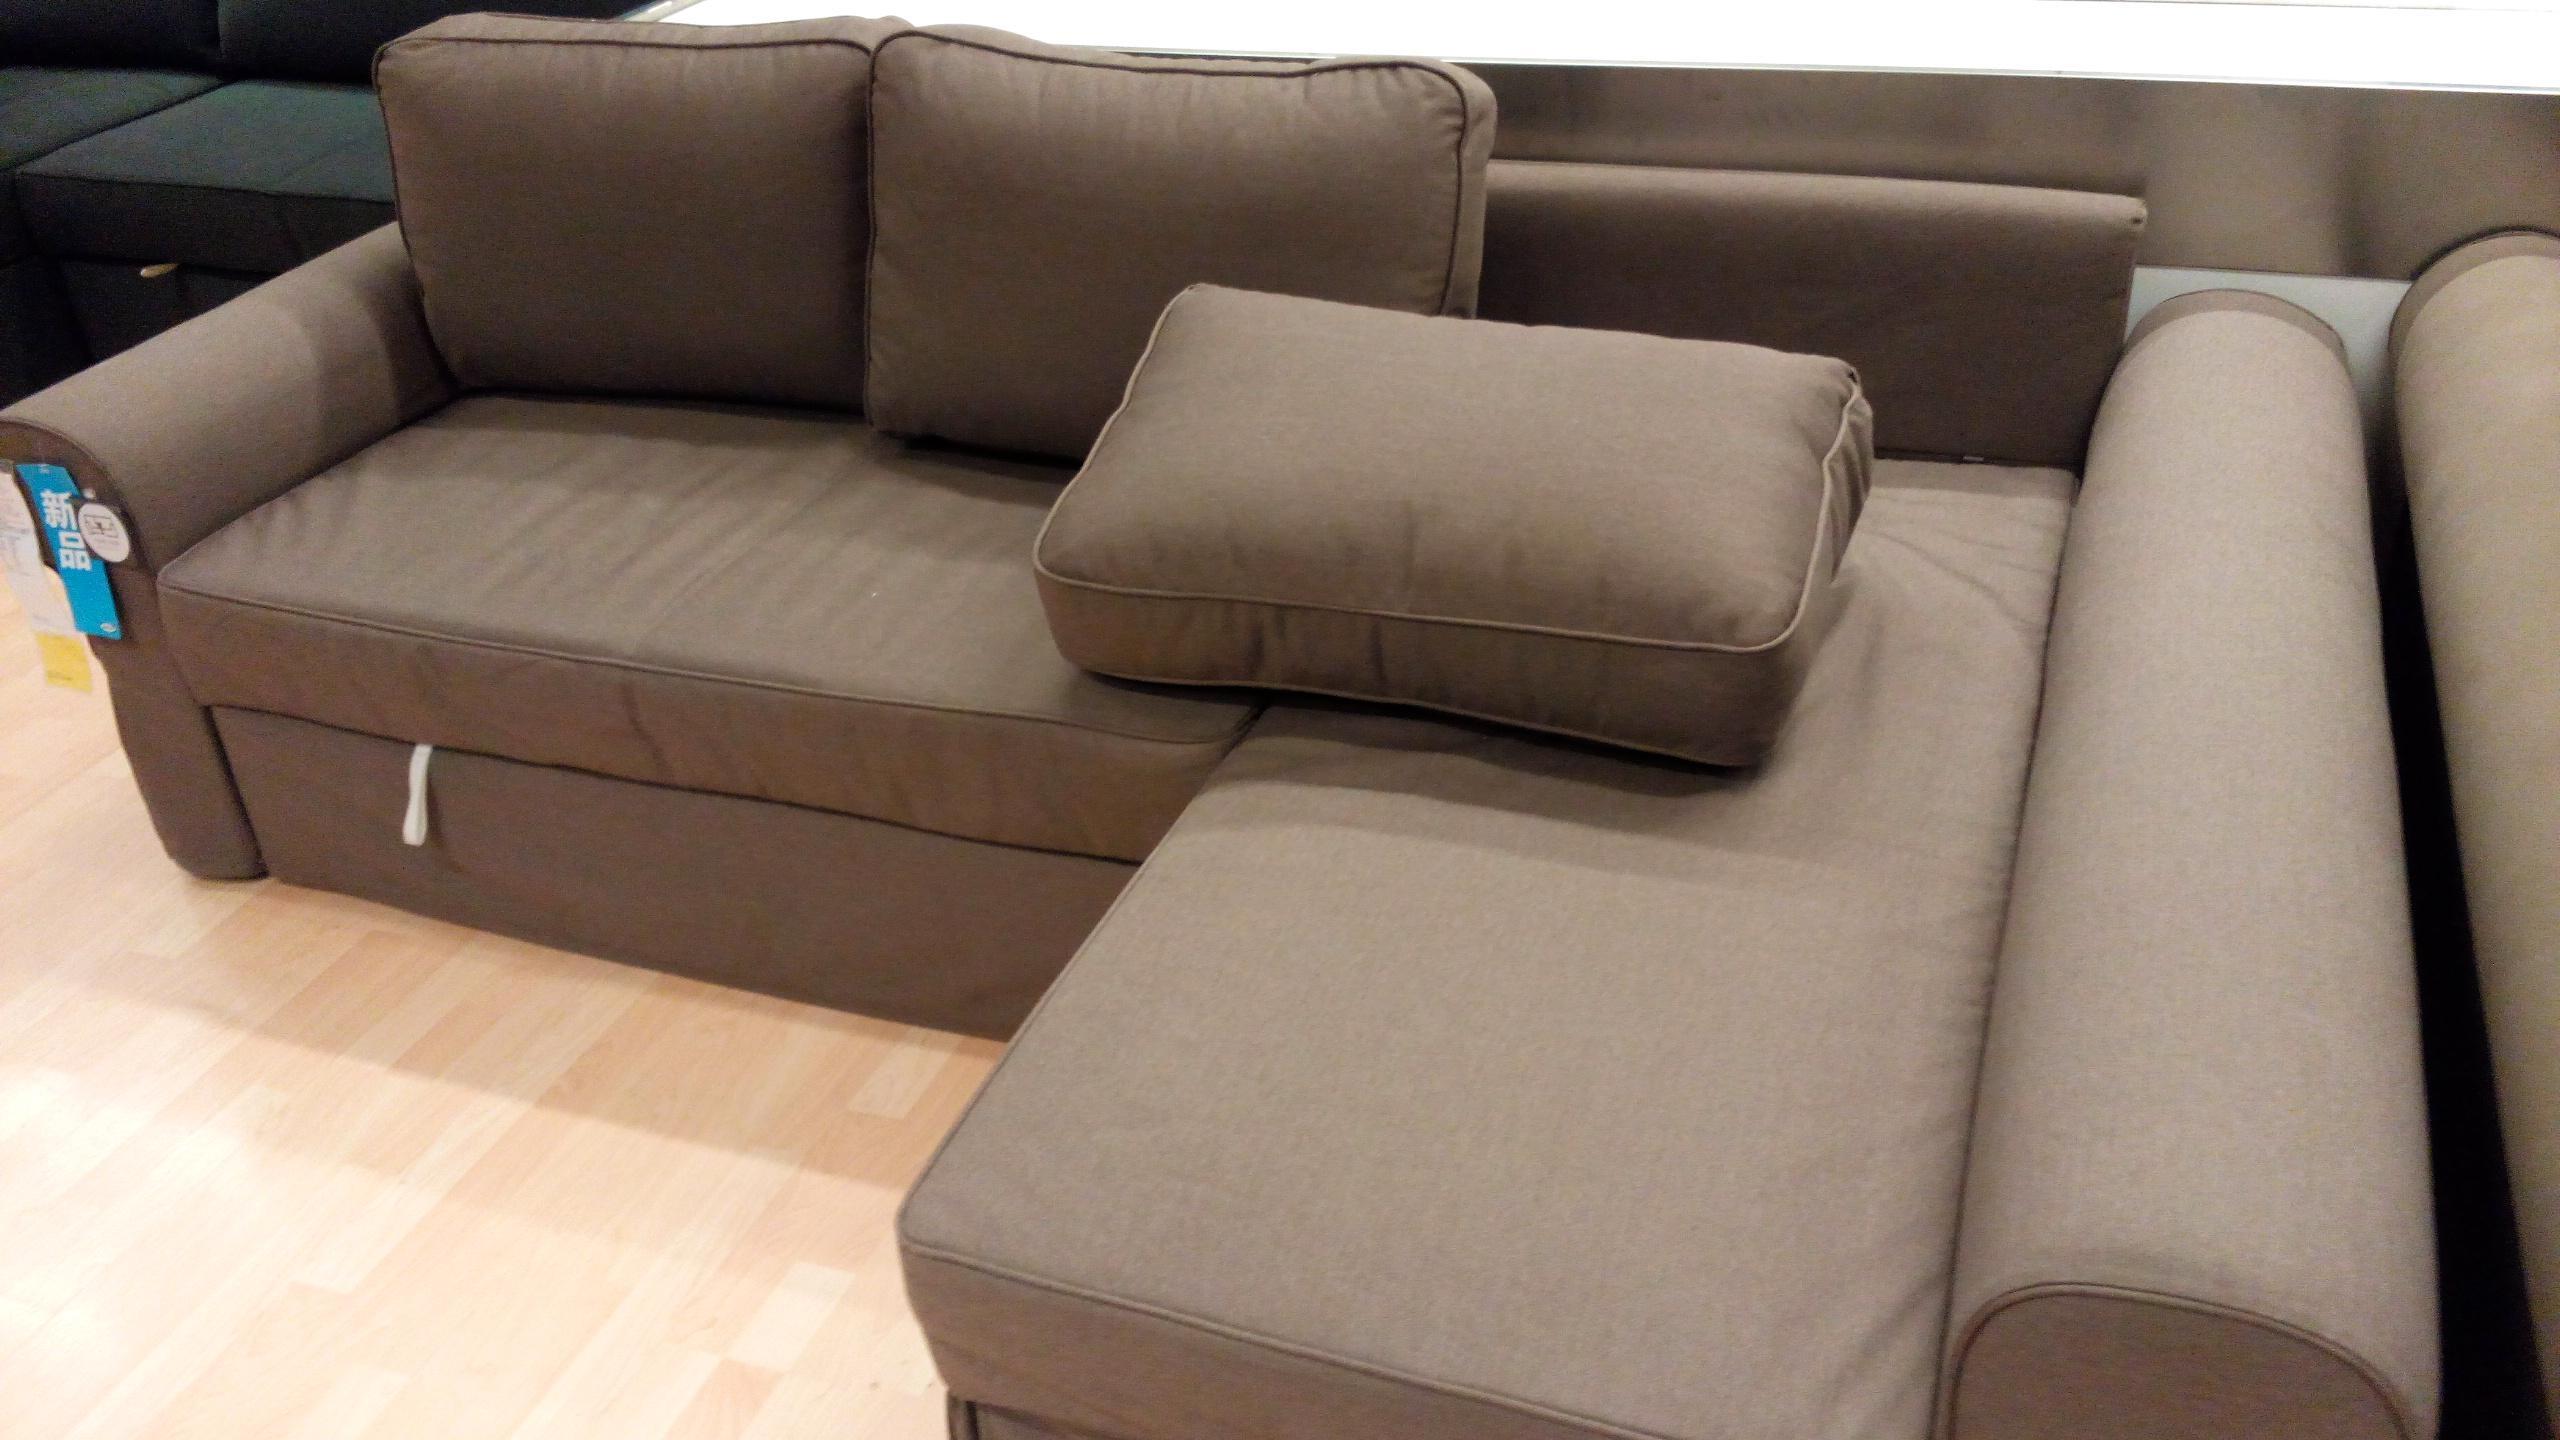 Ikea Vilasund And Backabro Review – Return Of The Sofa Bed Clones! Regarding Manstad Sofa Bed (Image 10 of 20)